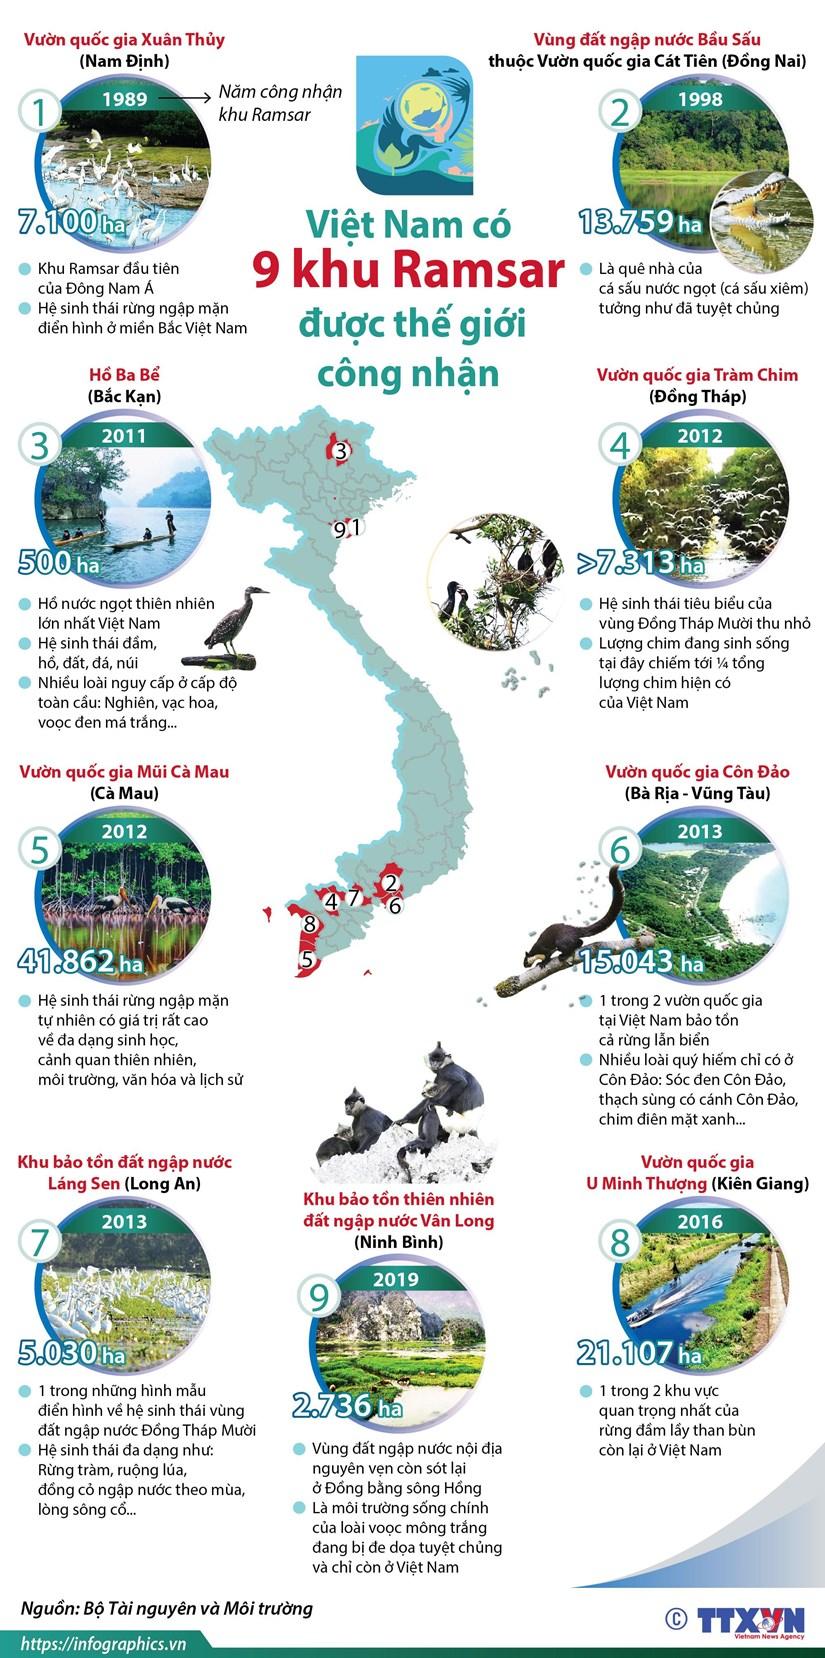 [Infographic] Viet Nam co 9 khu Ramsar duoc the gioi cong nhan hinh anh 1